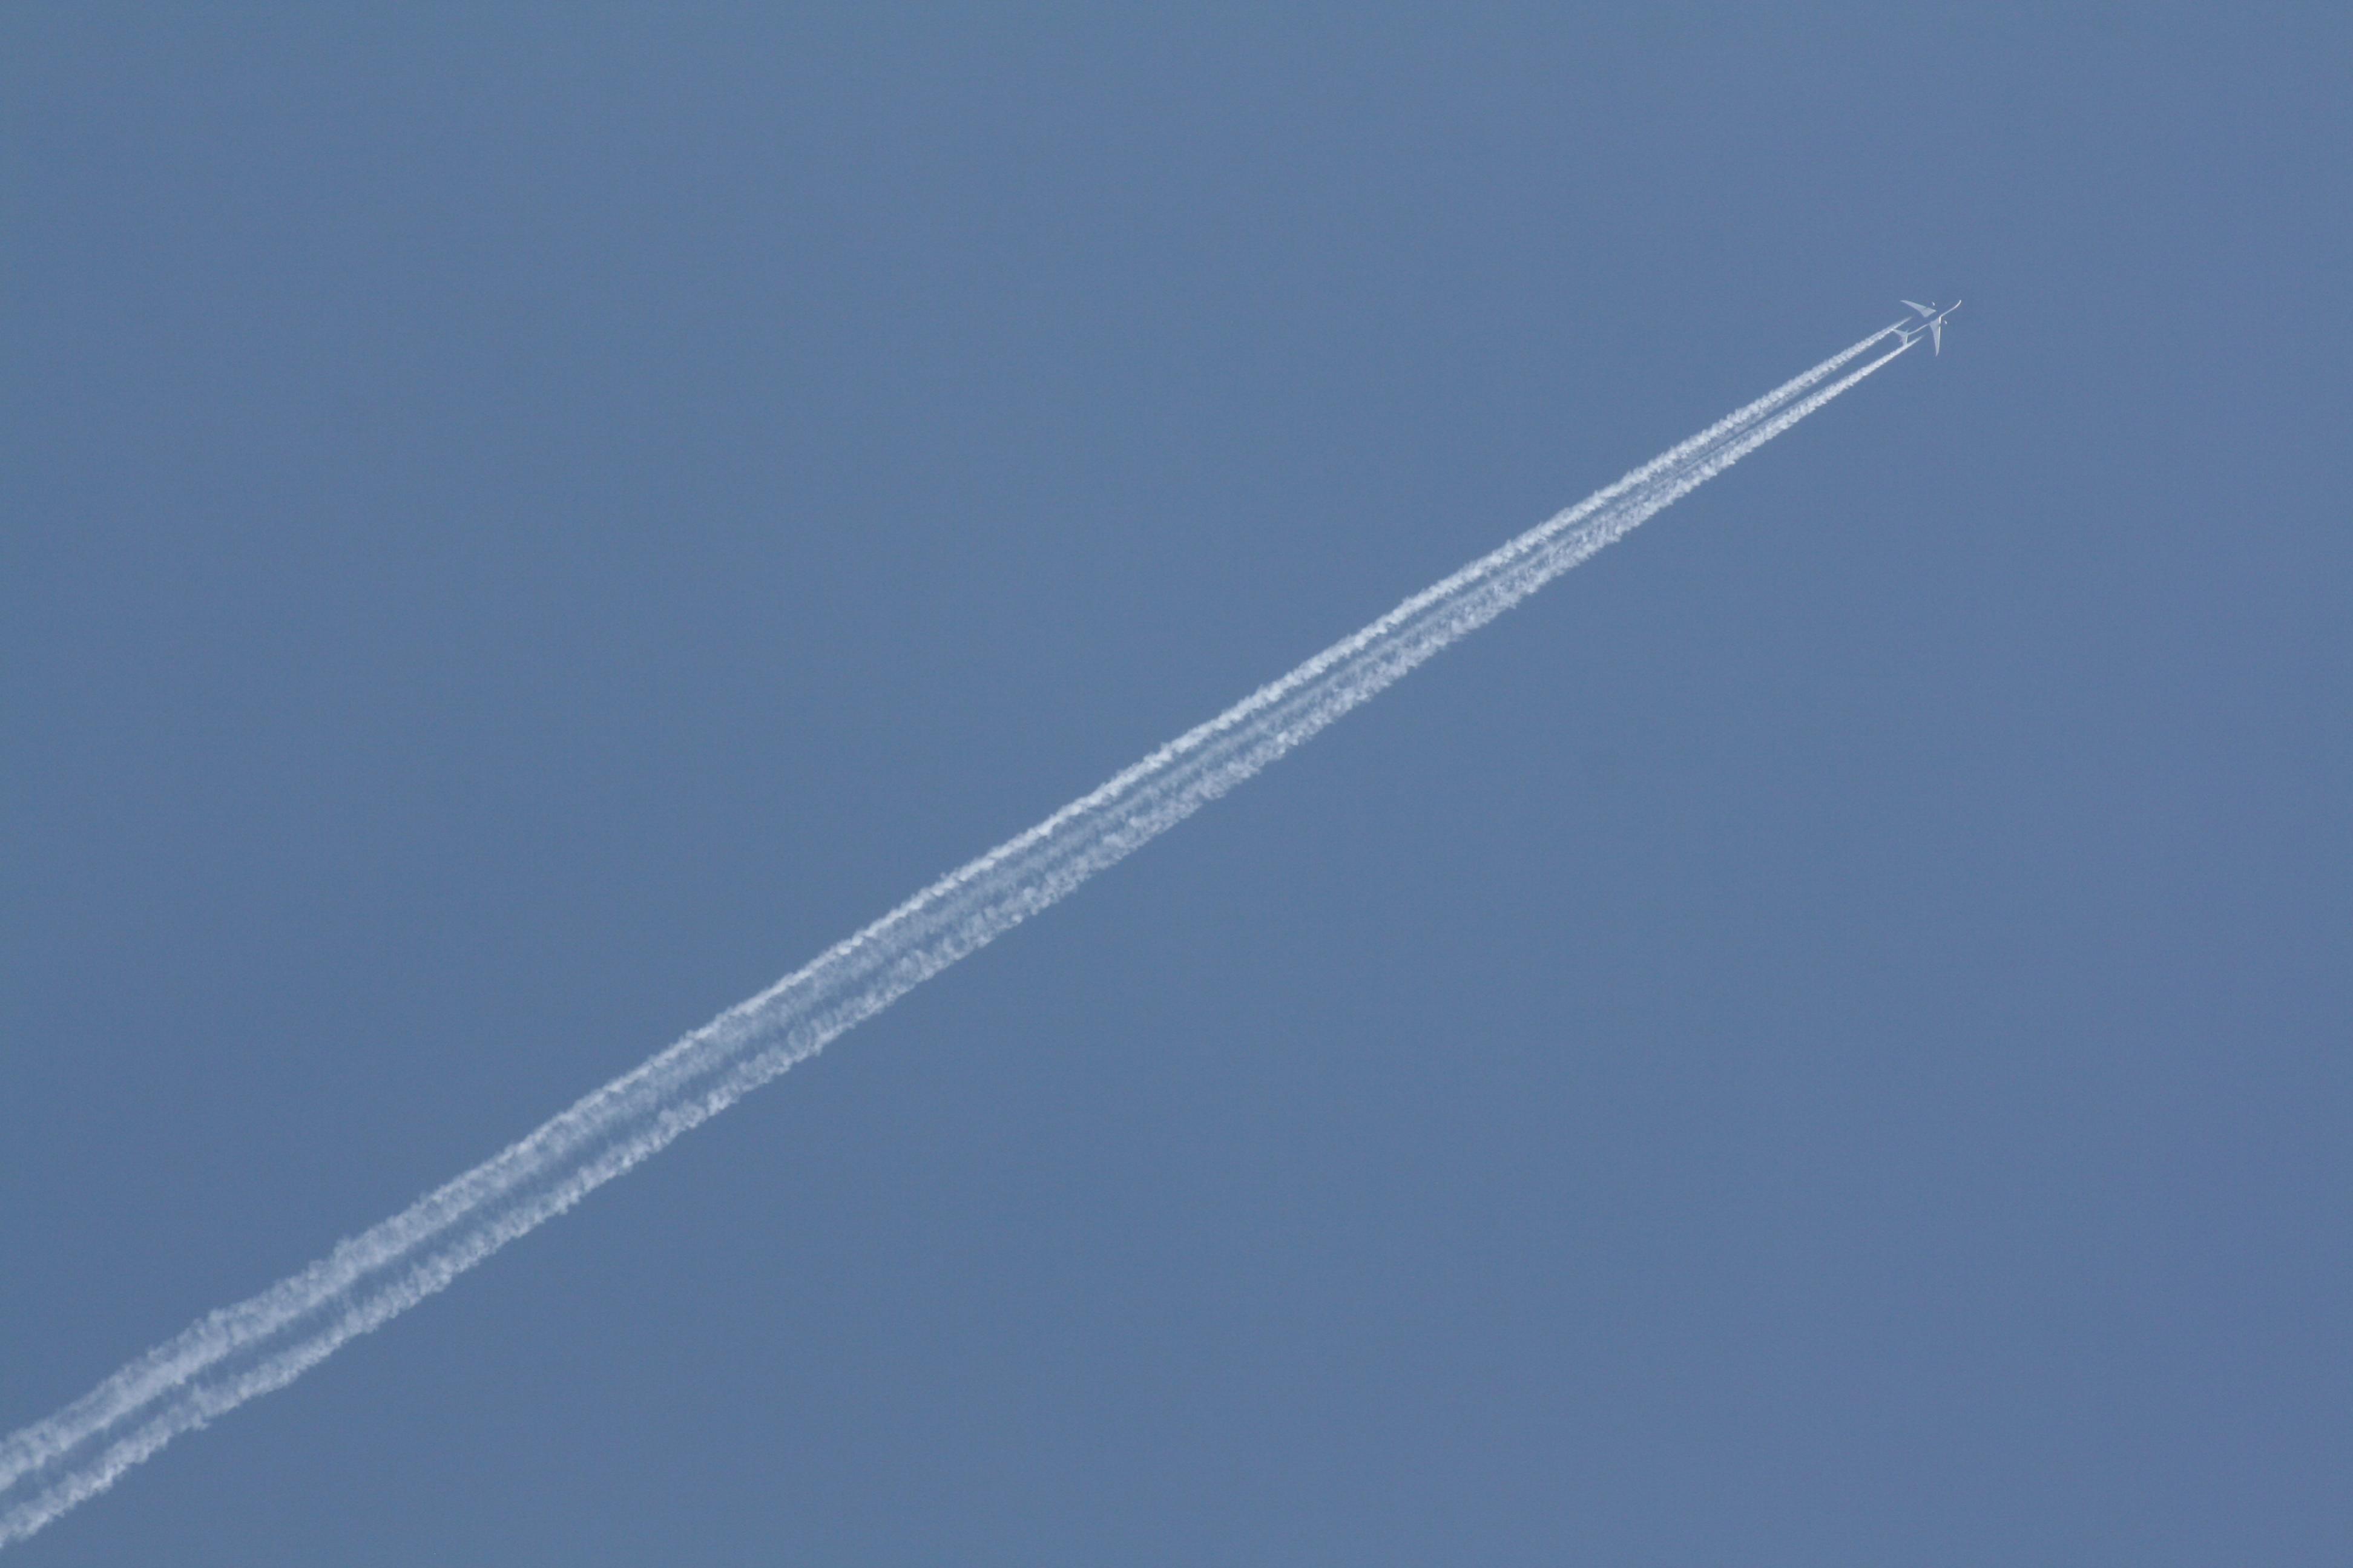 Naam: Boeing backgarden.jpg Bekeken: 492 Grootte: 391,7 KB